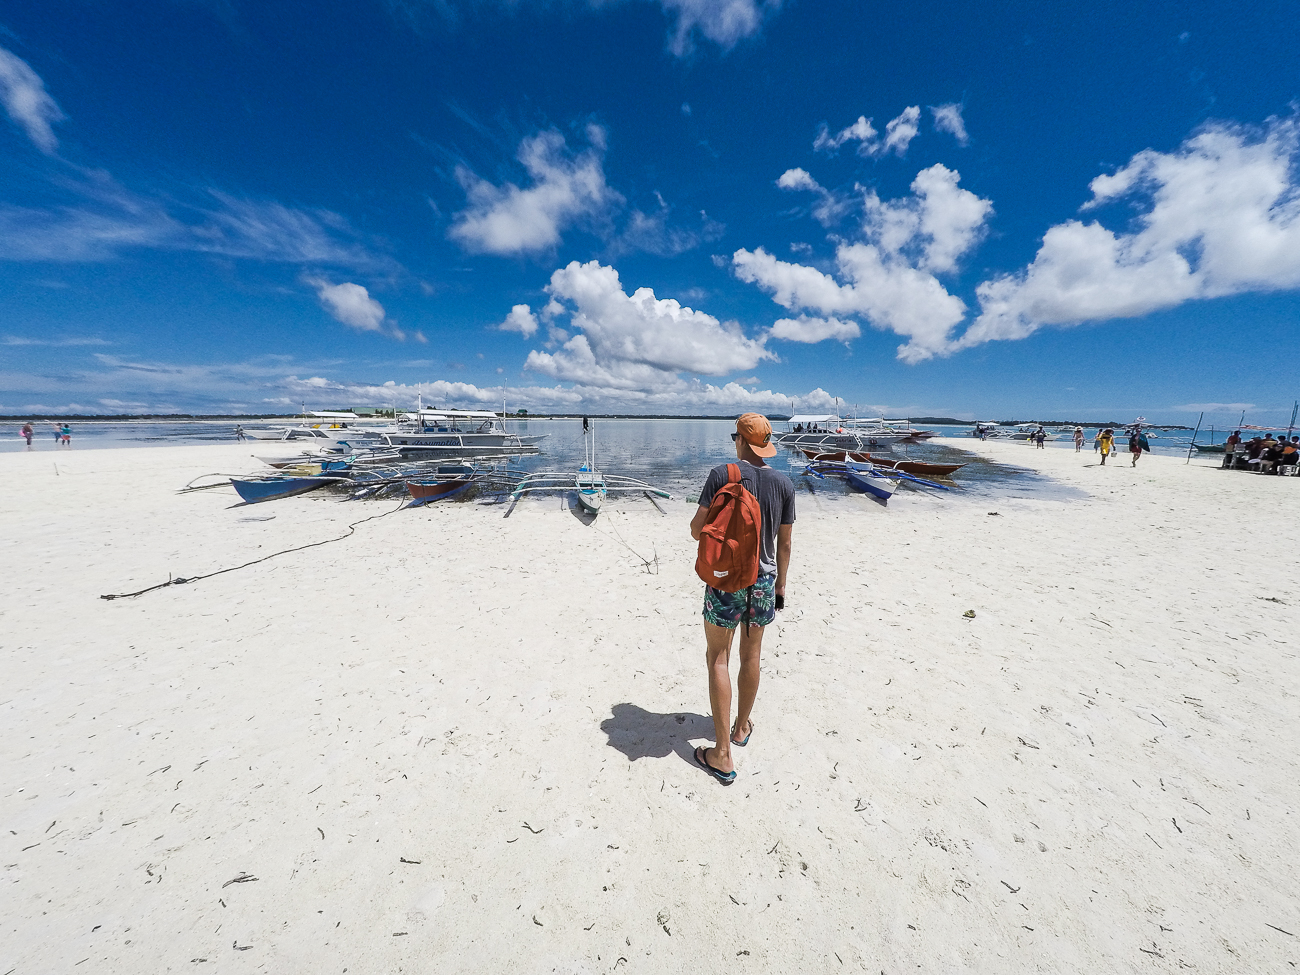 Bohol virgin island pictures Apple iPhone 7 Plus (Gold, 32 GB) - m